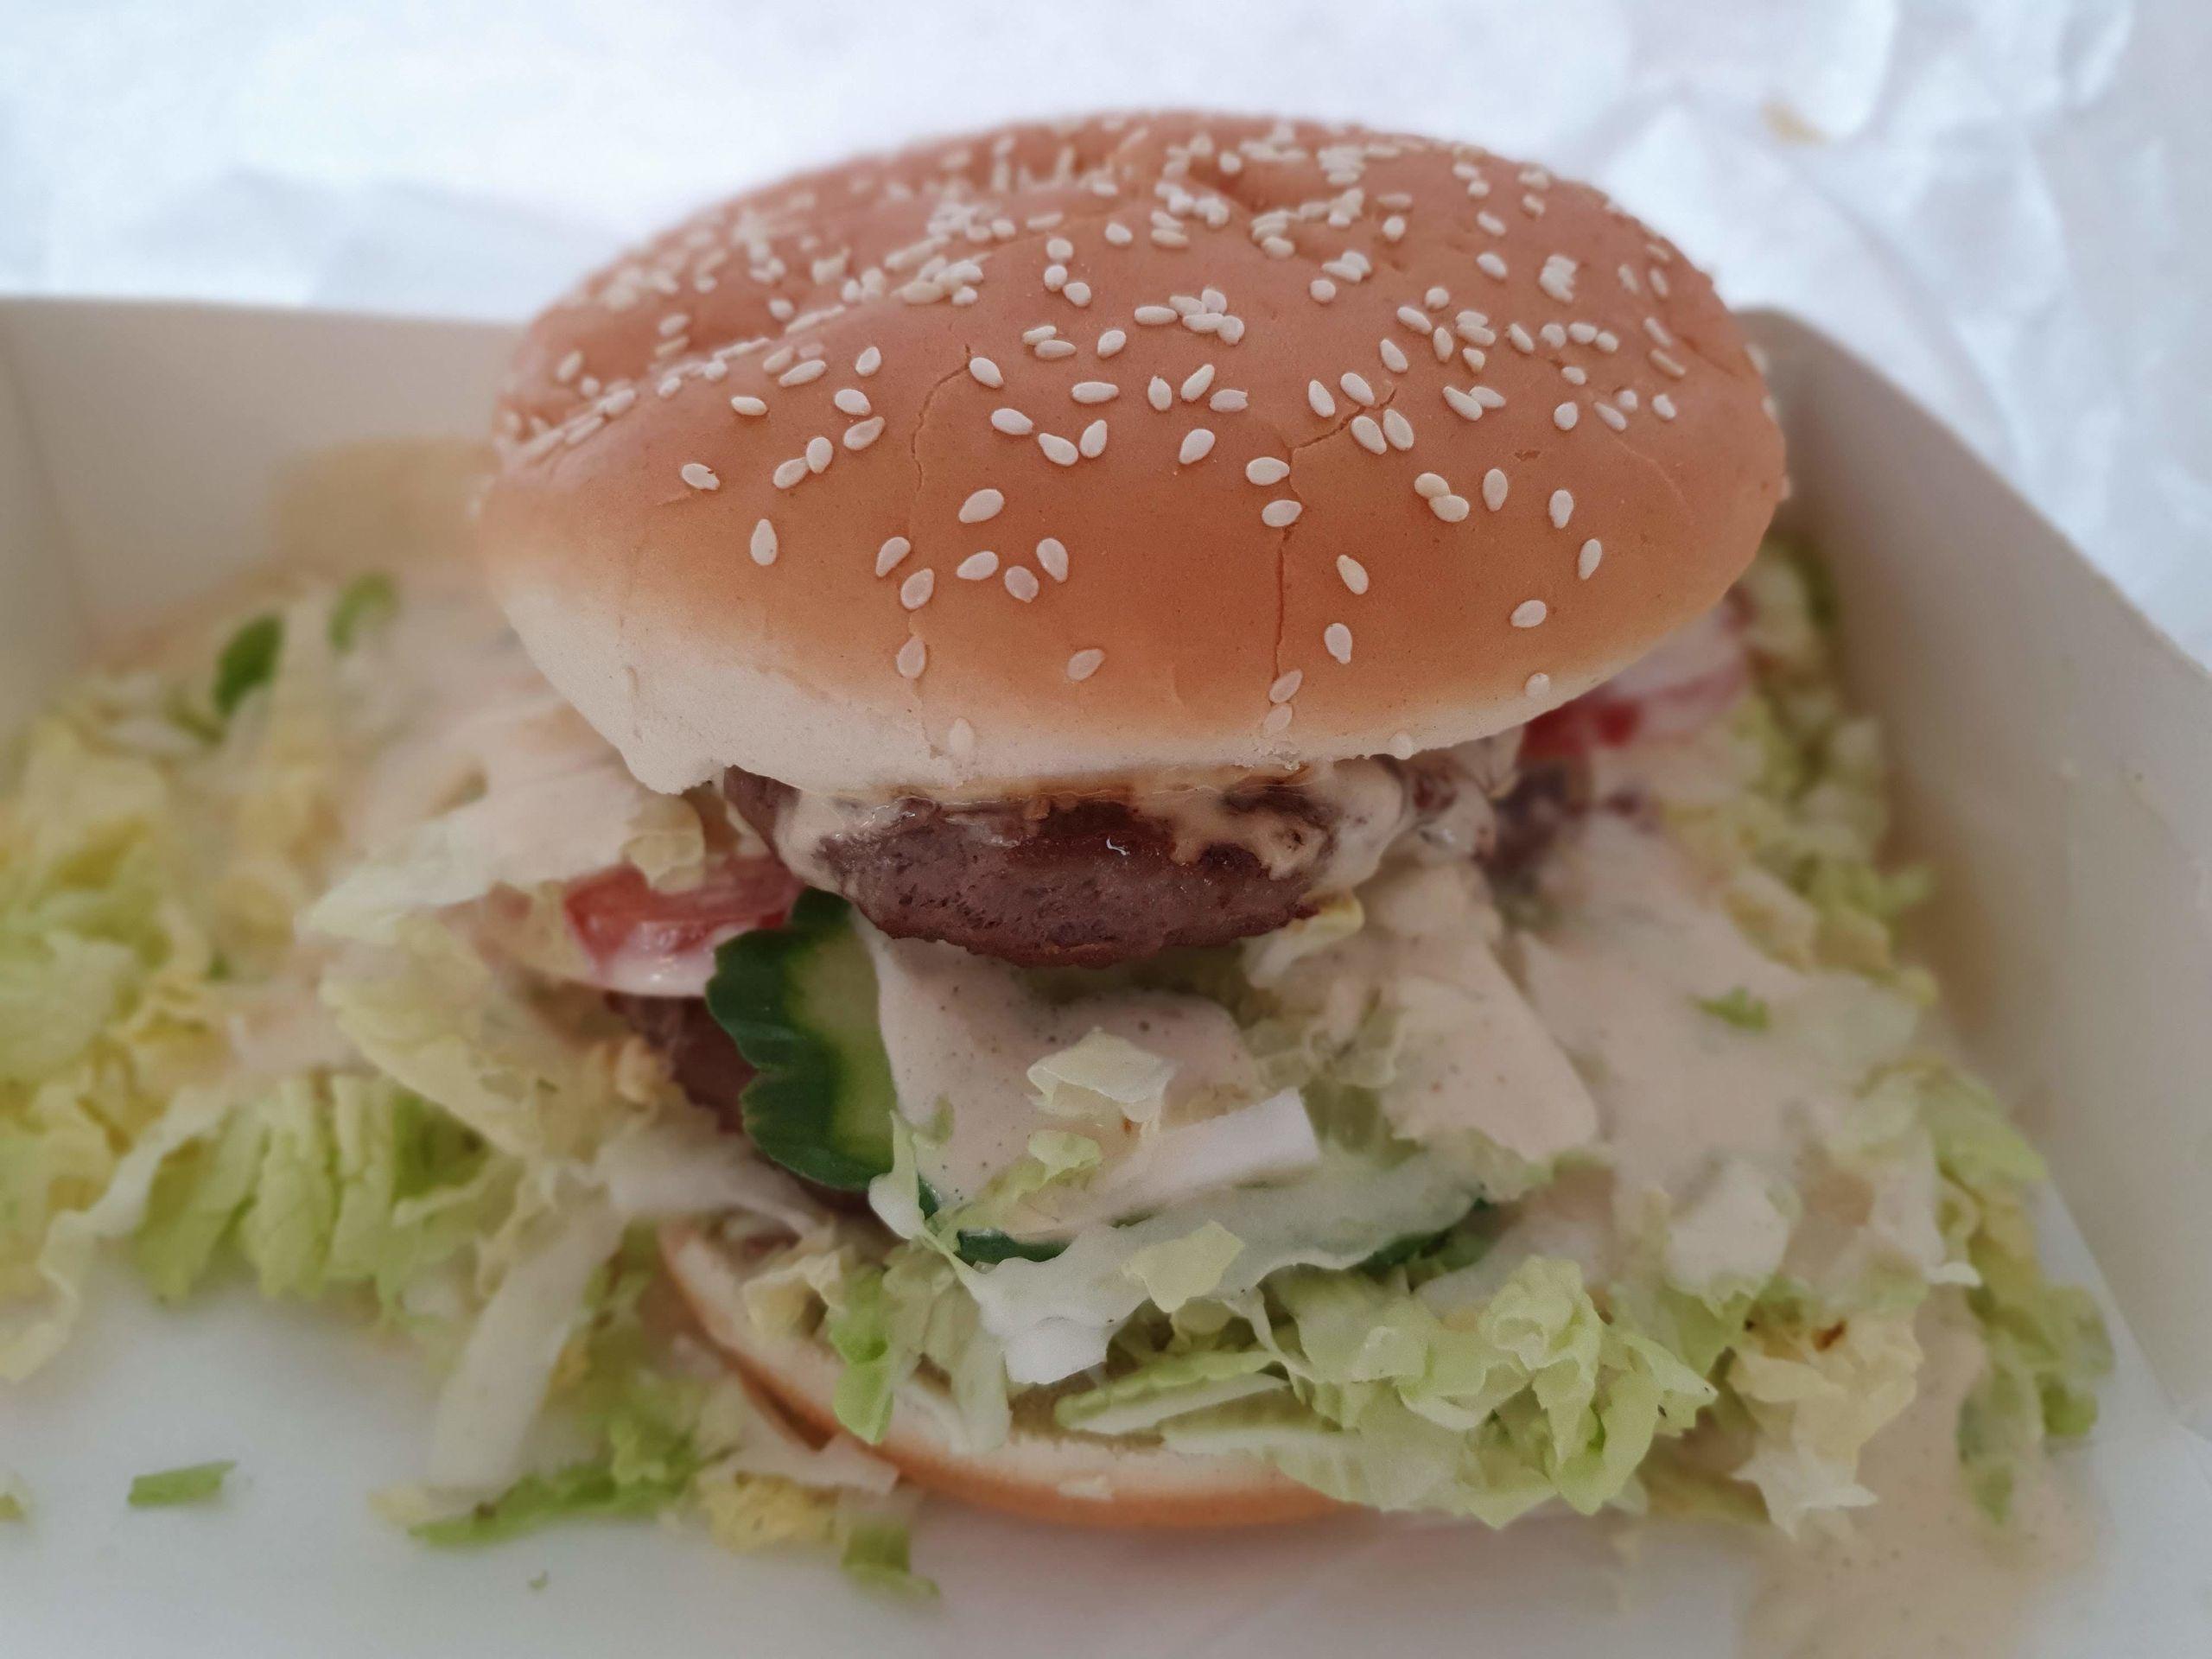 Druknet i dressing: Her er min ærlige mening om legendarisk burger